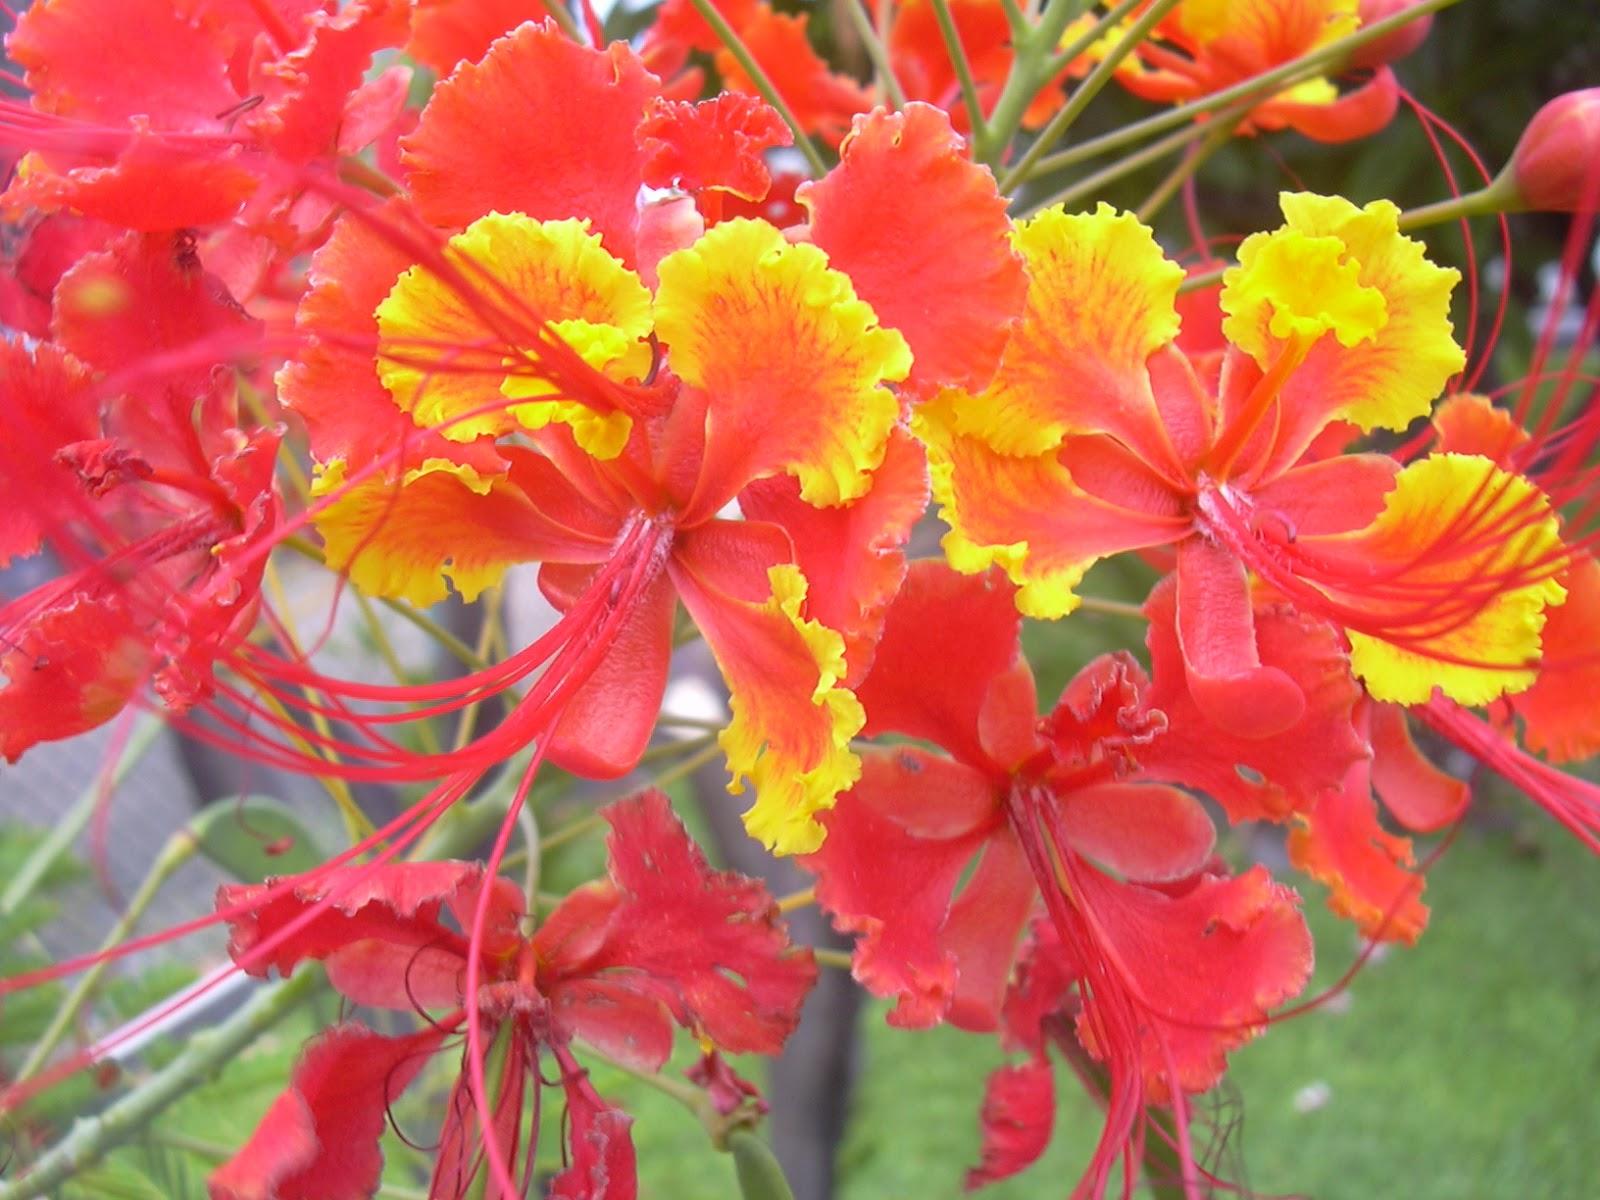 Morfologi tumbuhan praktikum vi bunga majemuk bunga merak caesalpinia pulcherrima swart ccuart Image collections